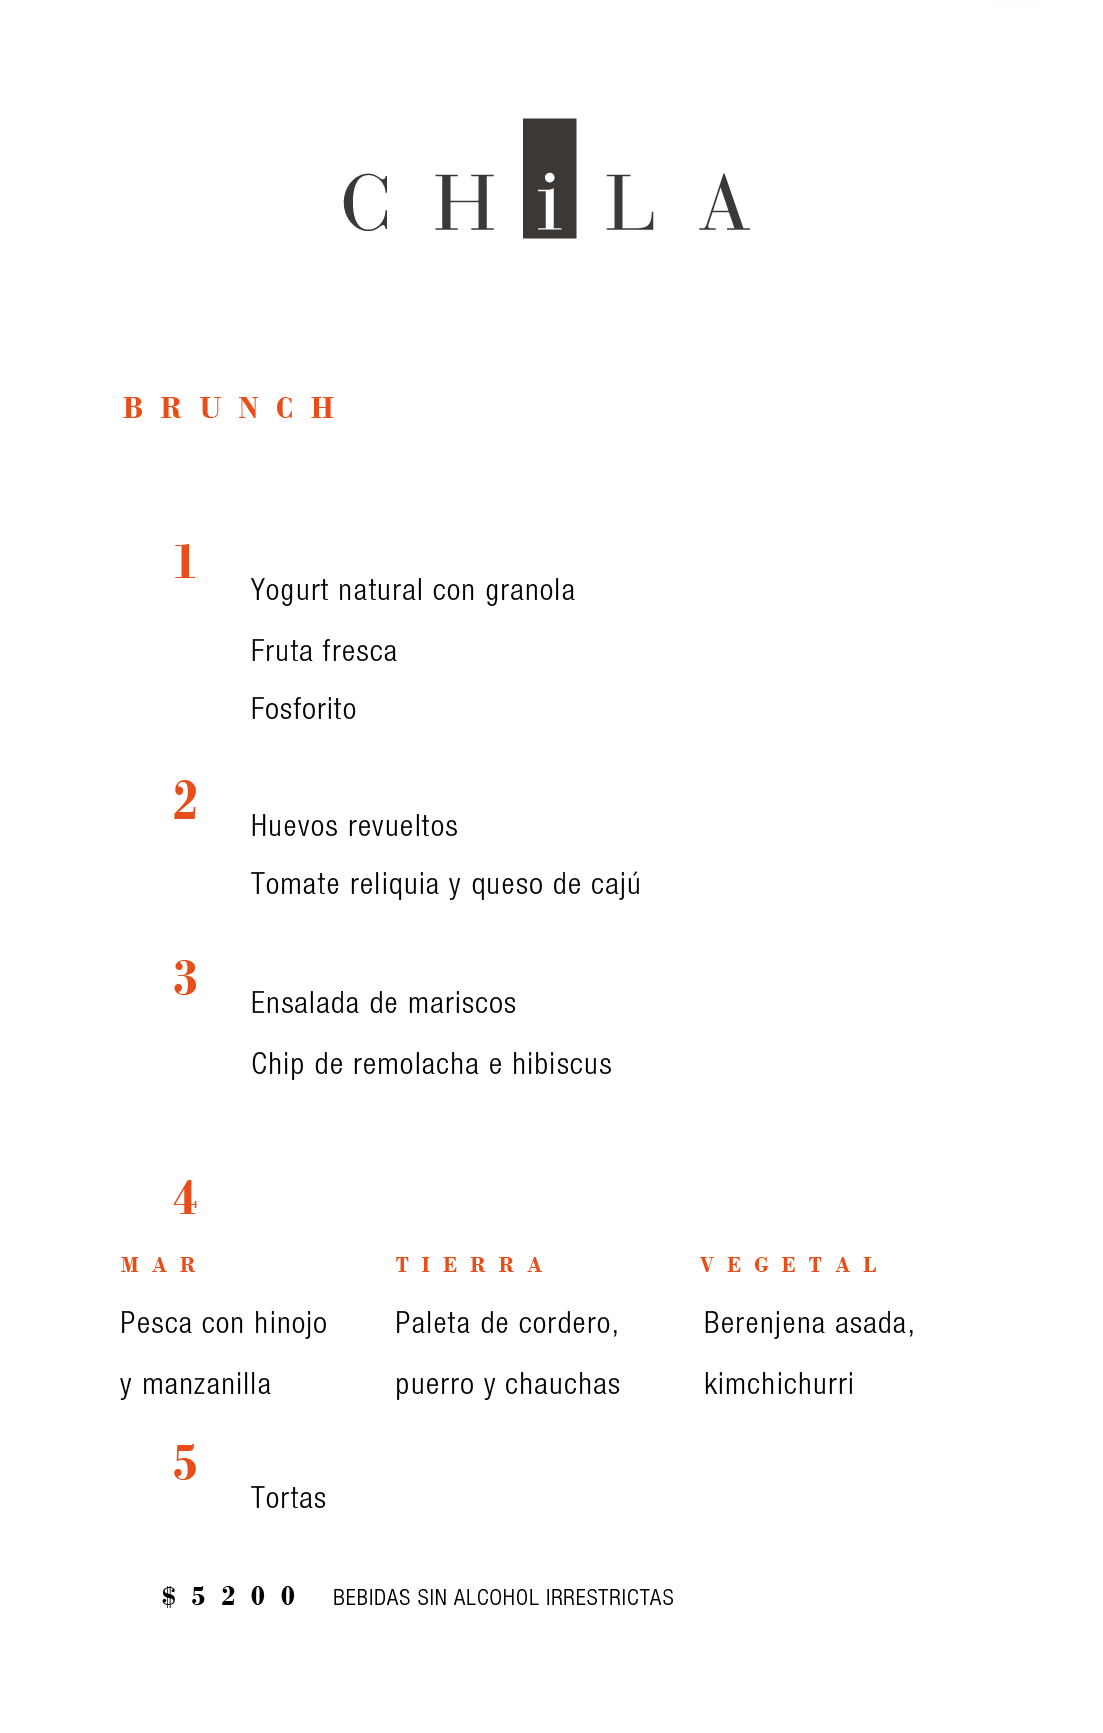 https://www.chilarestaurant.com/brunch-esp_brunch-esp/